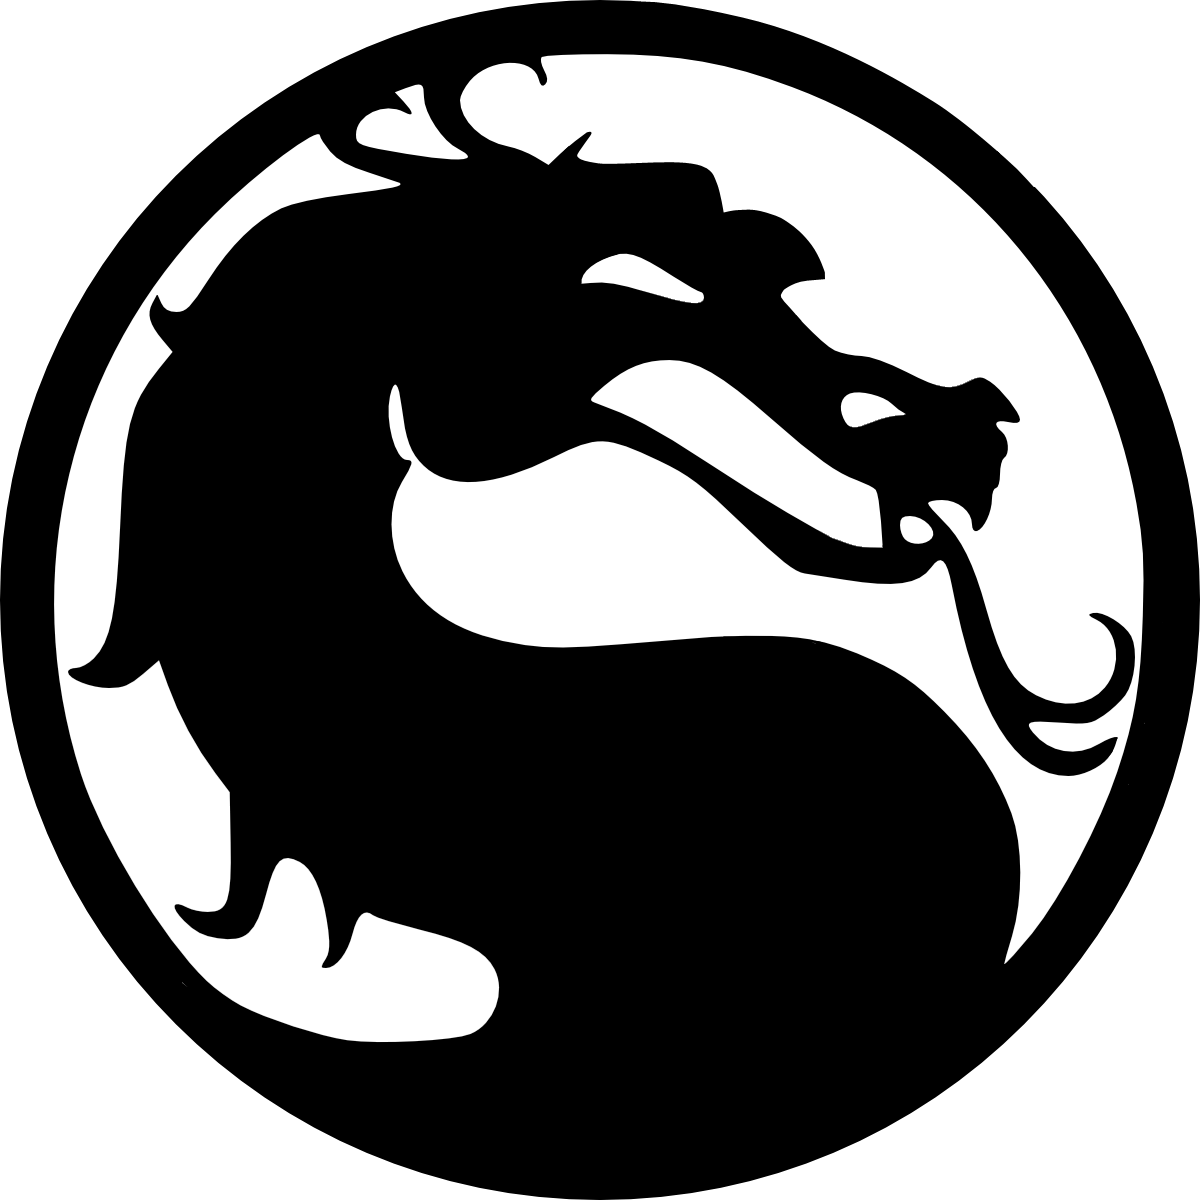 Mortal Kombat silhouette.png-Mortal Kombat silhouette.png-17